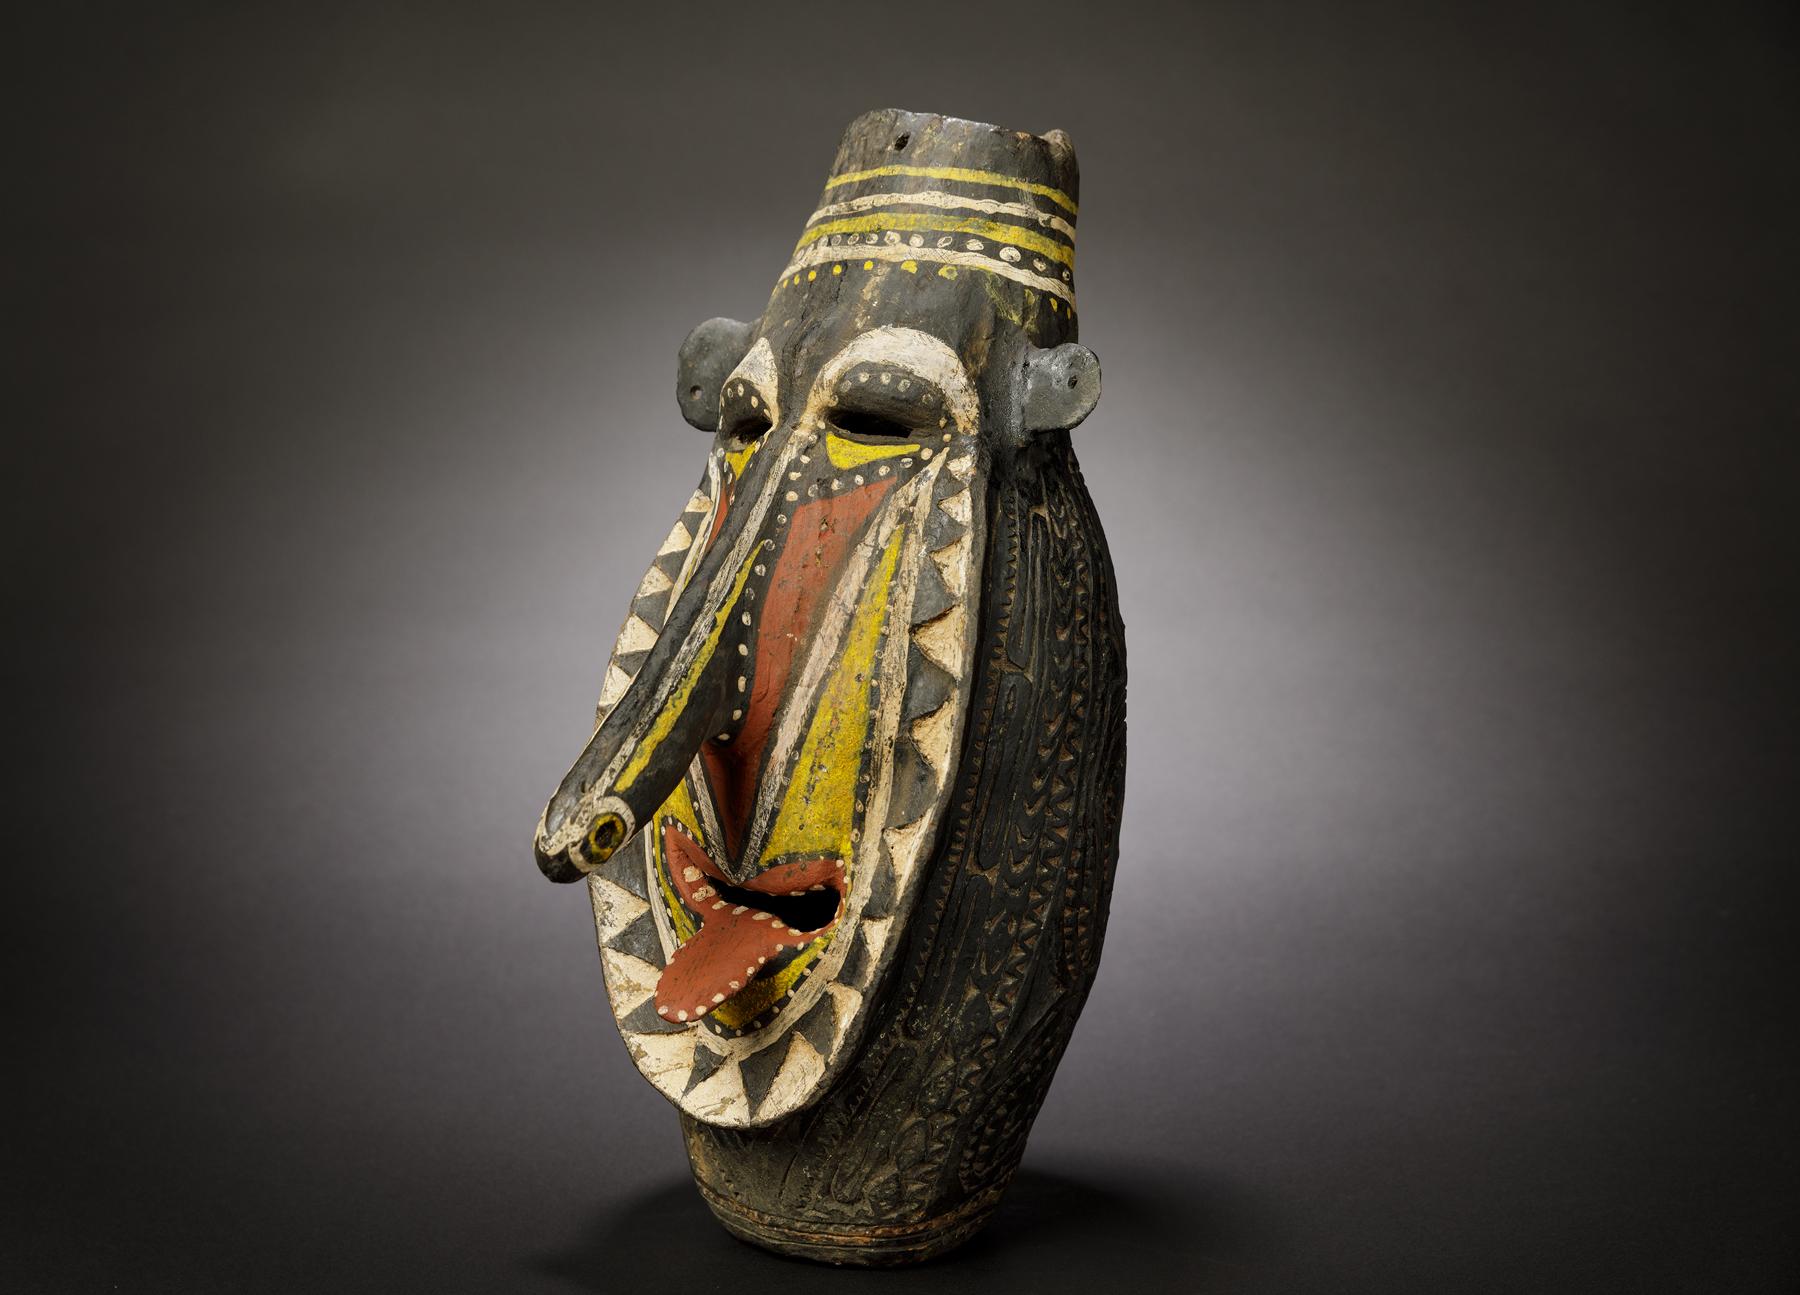 A Superb Waskuk Ritual Pottery Head Kwoma People Upper Sepik River PNG